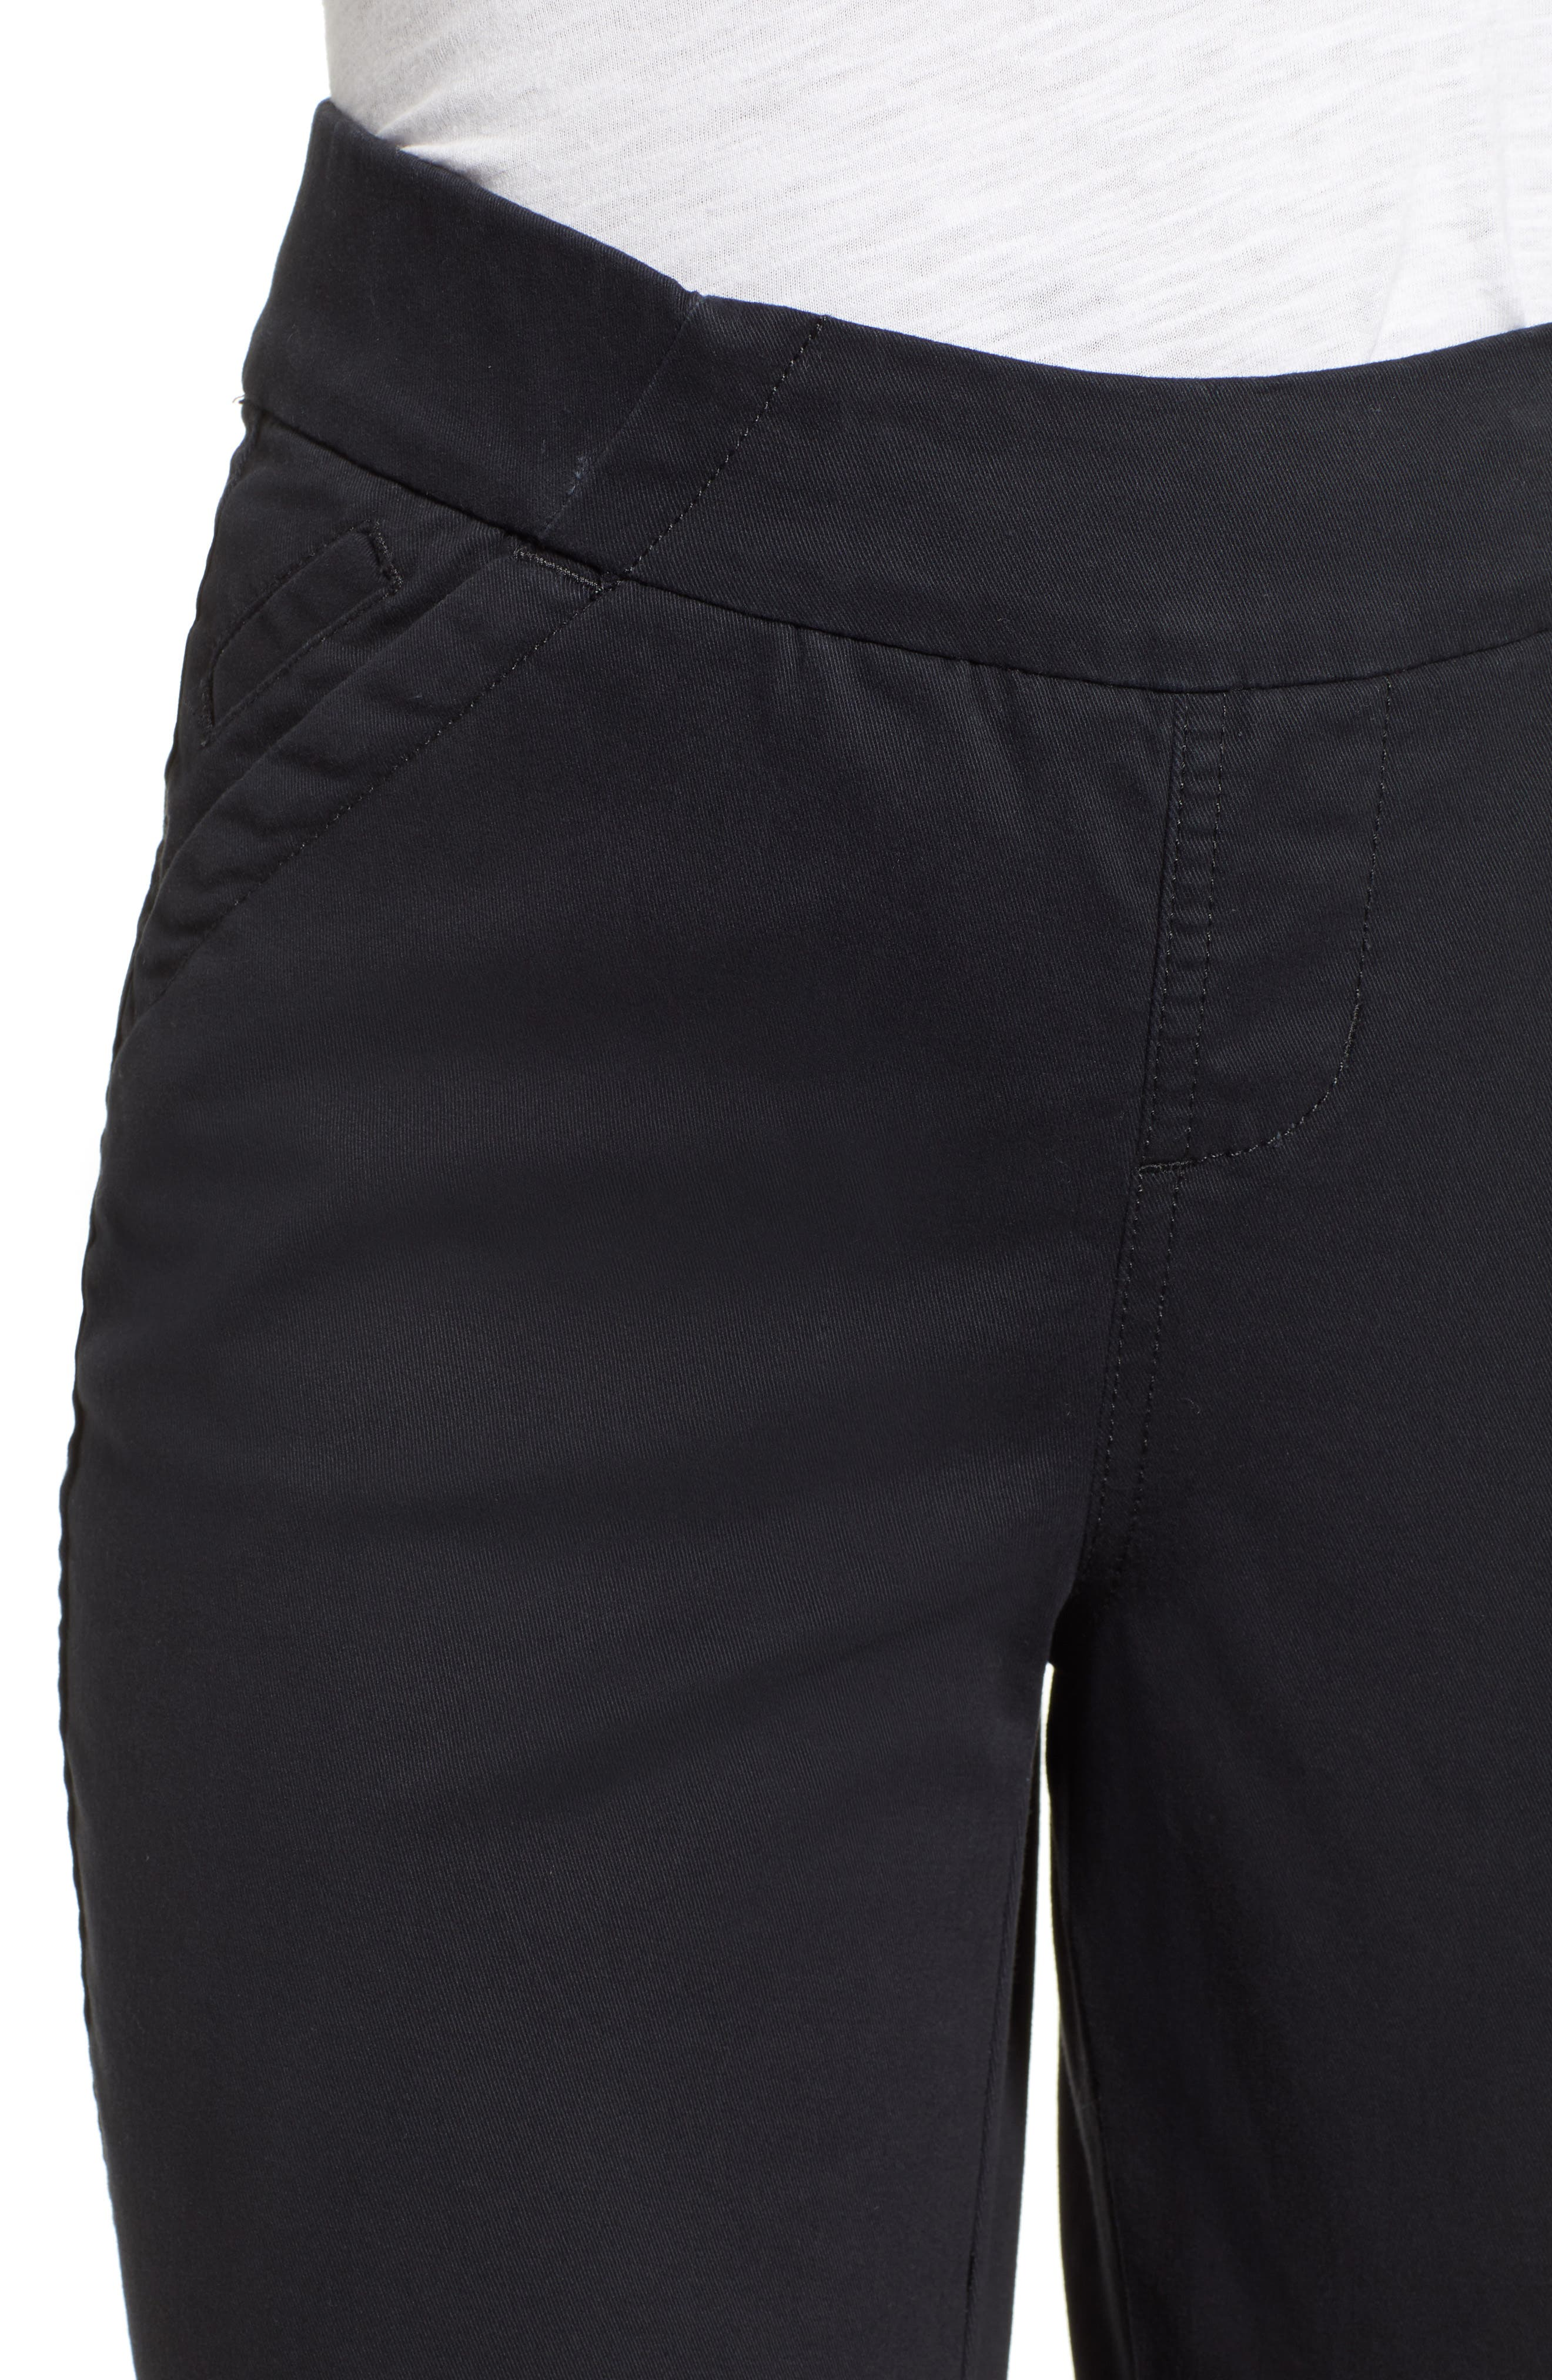 JAG JEANS, Gracie Bermuda Shorts, Alternate thumbnail 5, color, BLACK